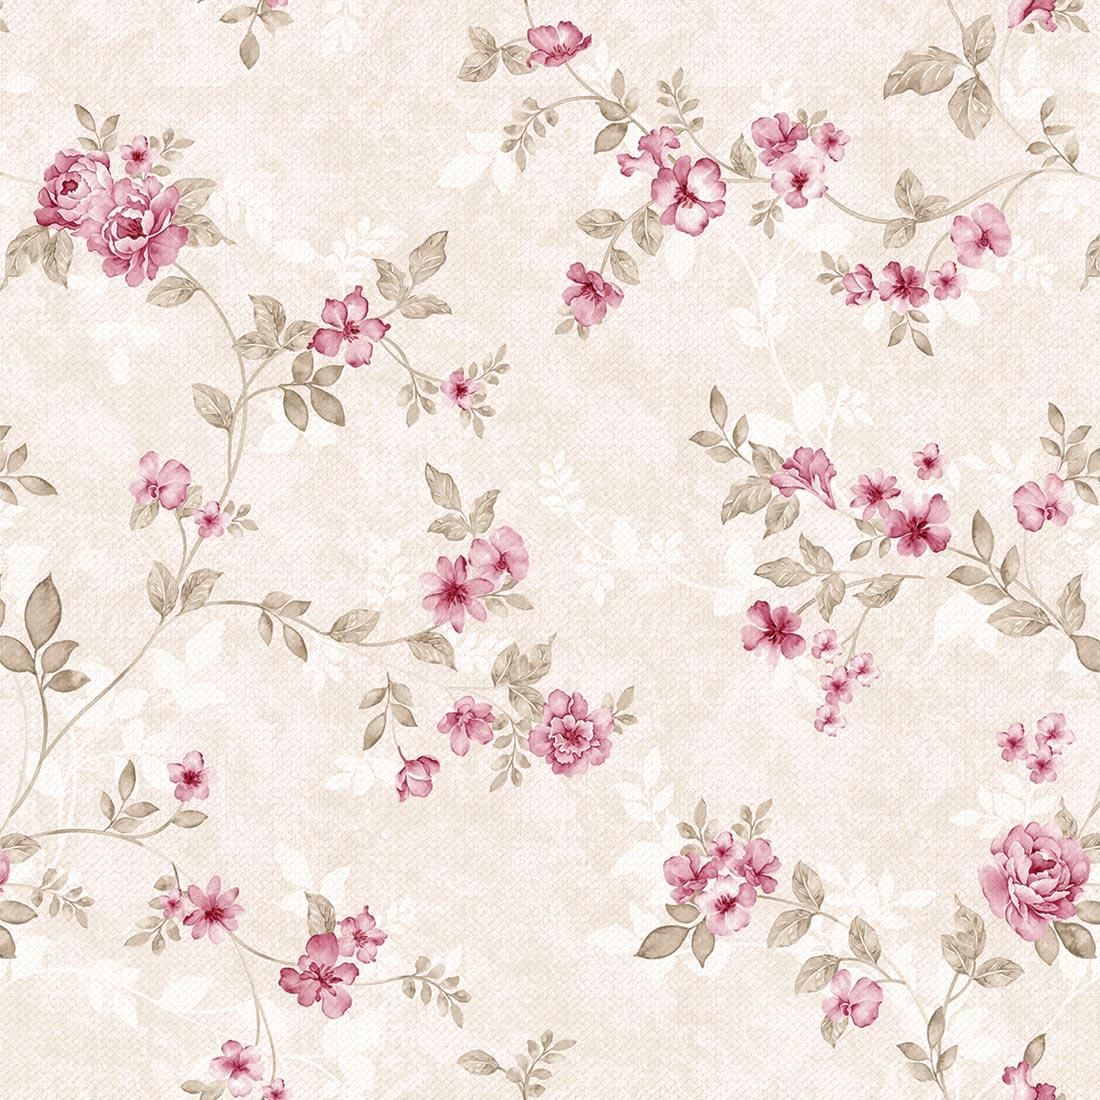 Papel de Parede Floral Rosa do Campo